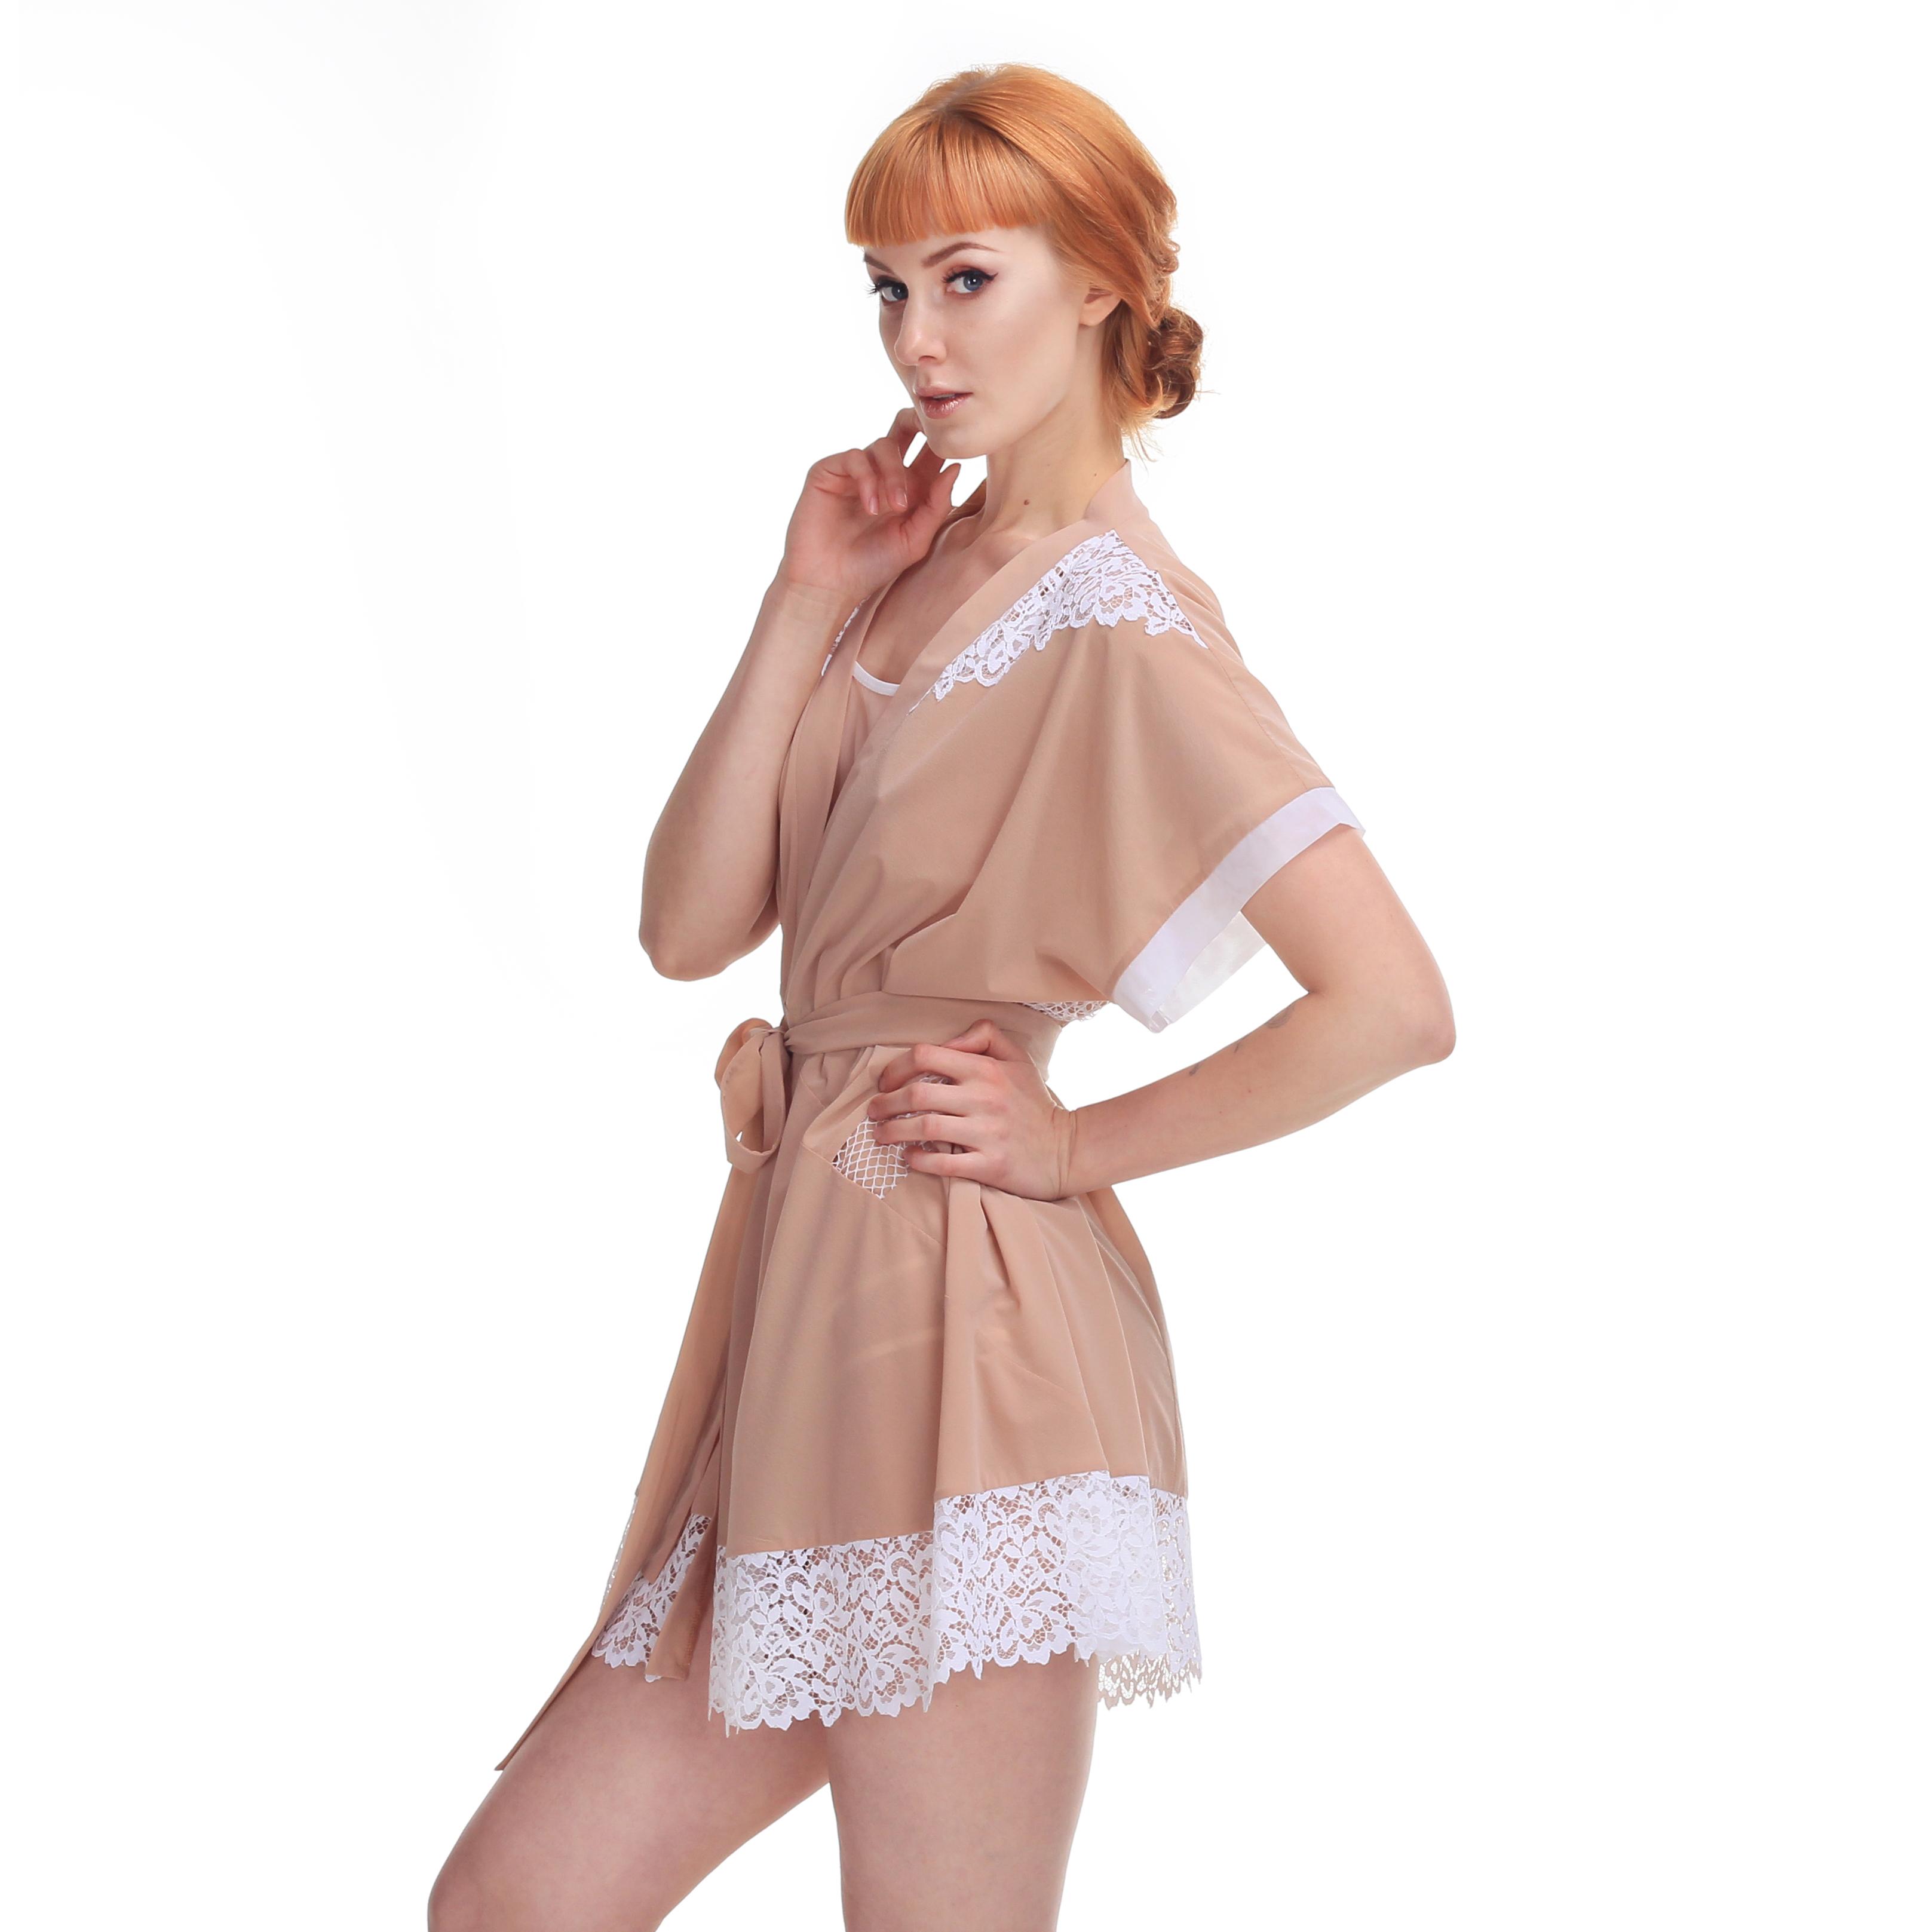 Nude Short Kimono With White Lace